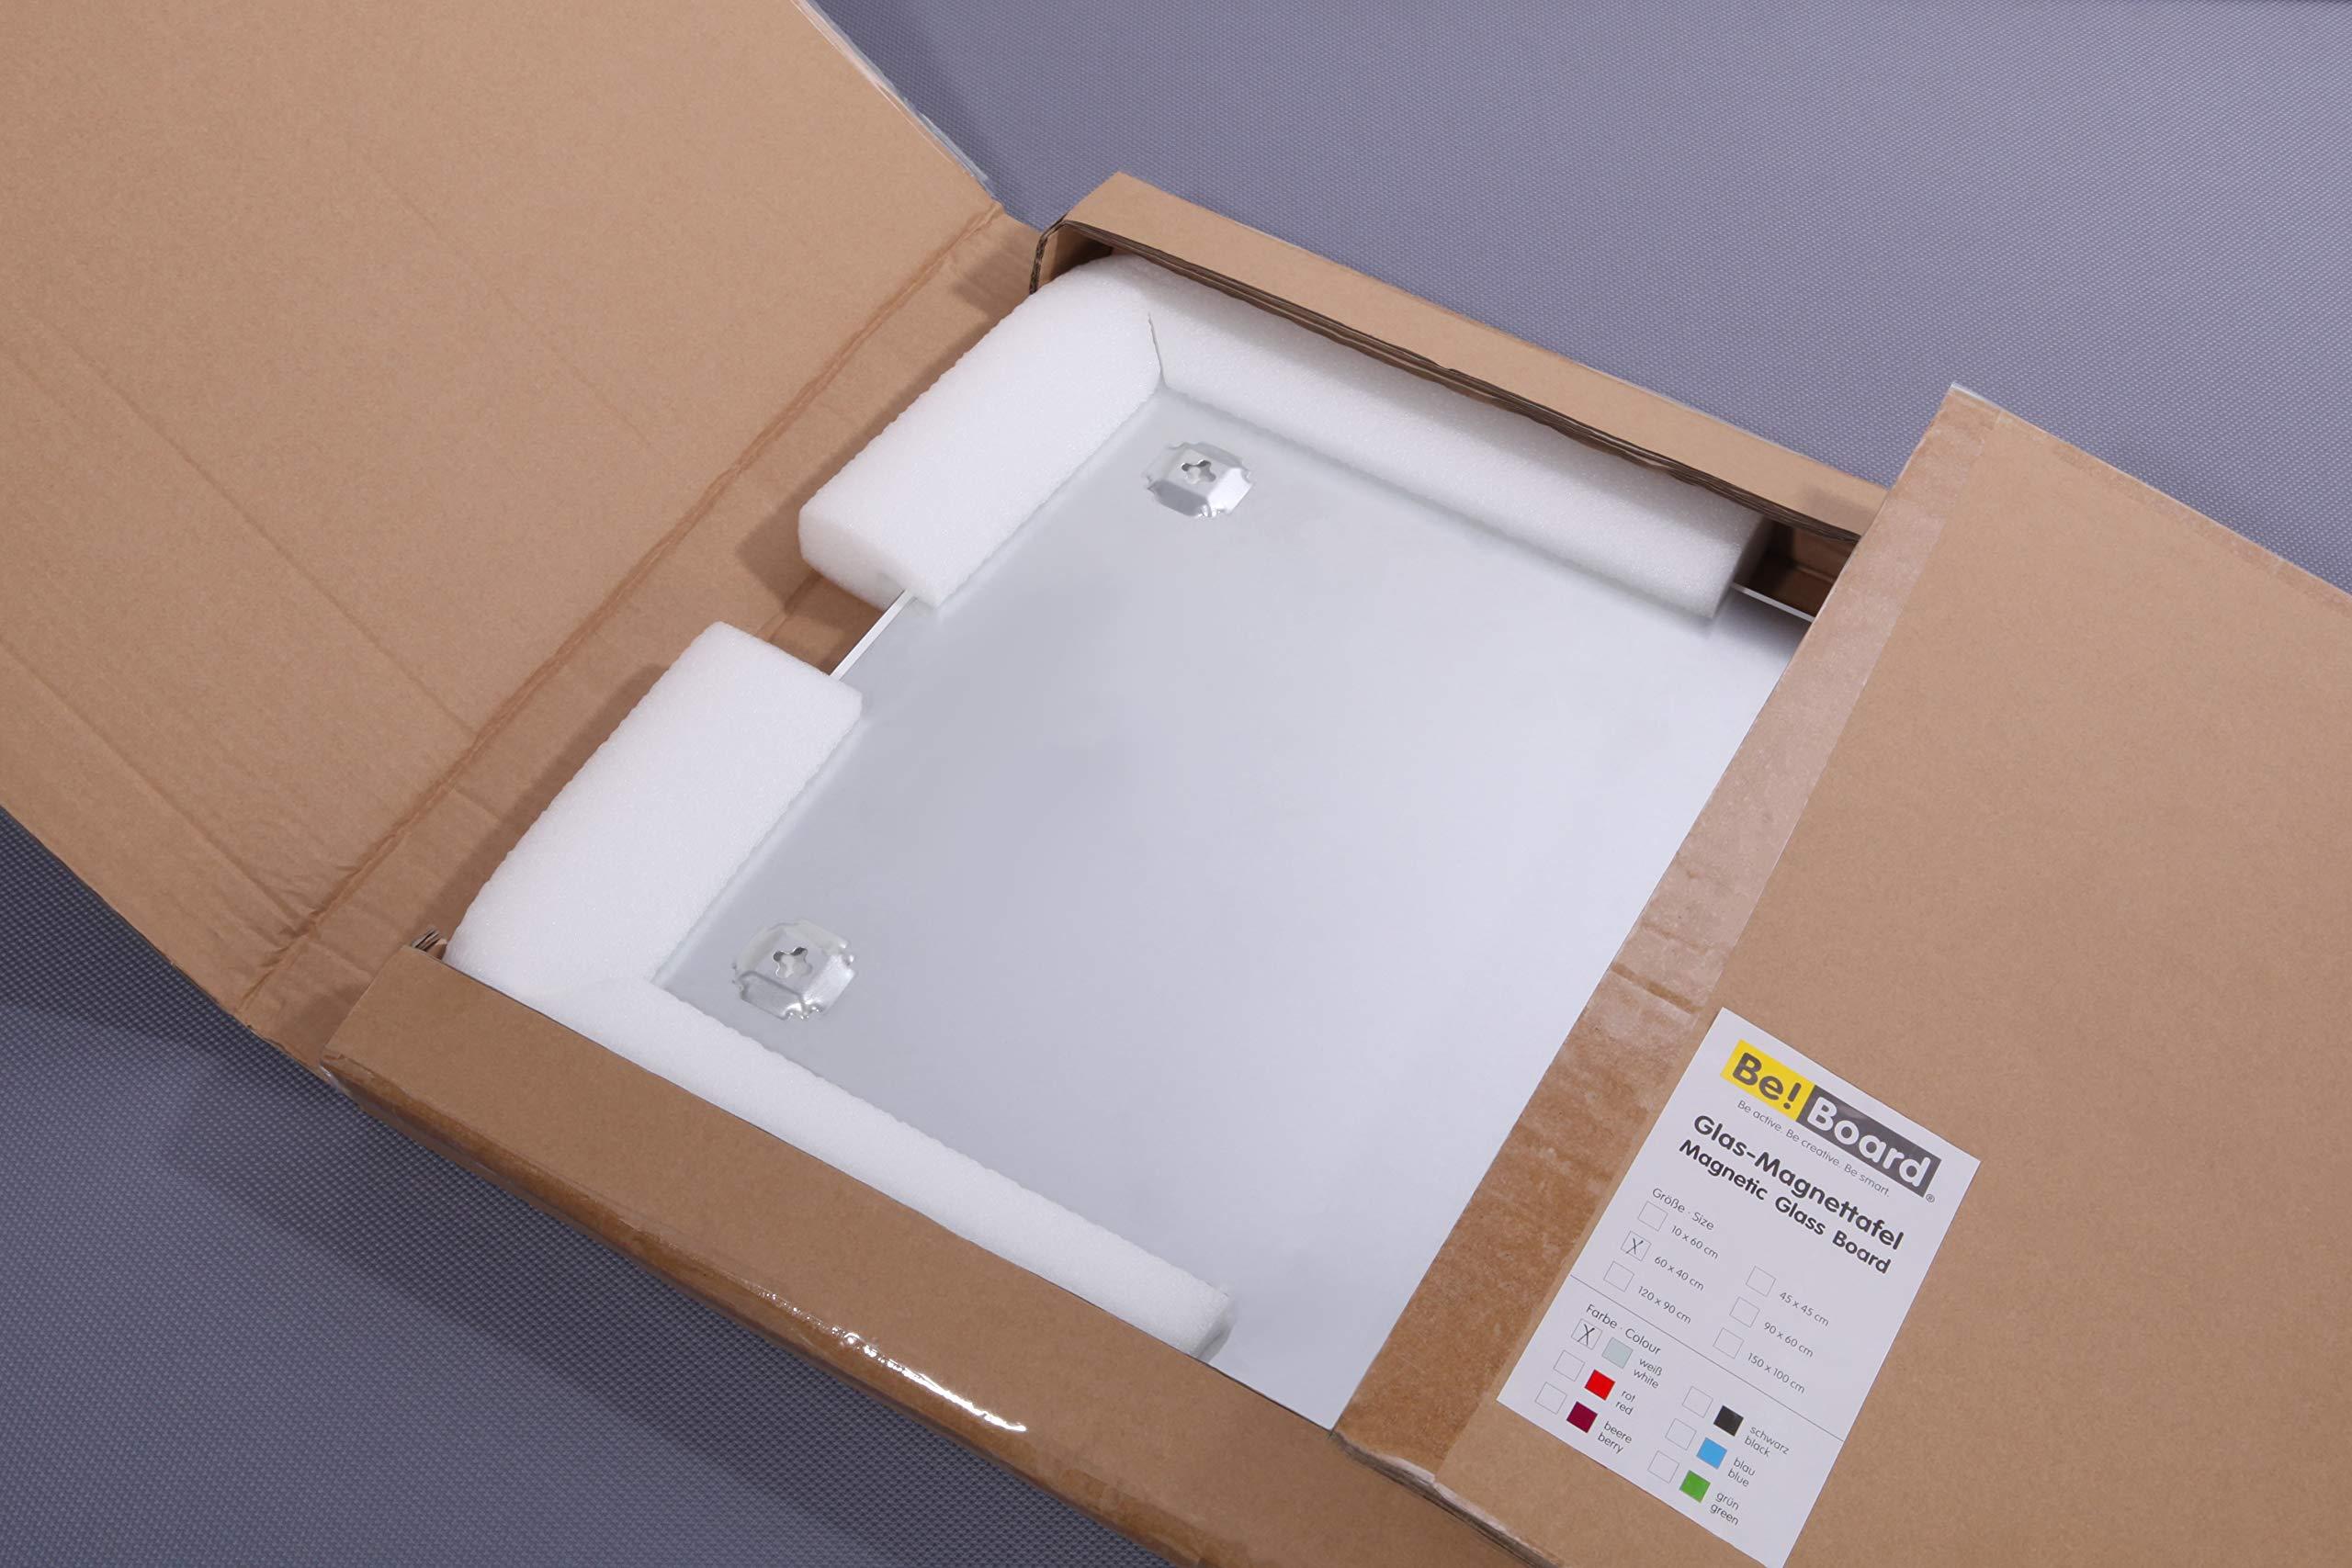 Whiteboard Be!Board B1100 Magnetic Glass Board Dry Wipe Board 45 x 45 cm pure white Magnetic Pinboard